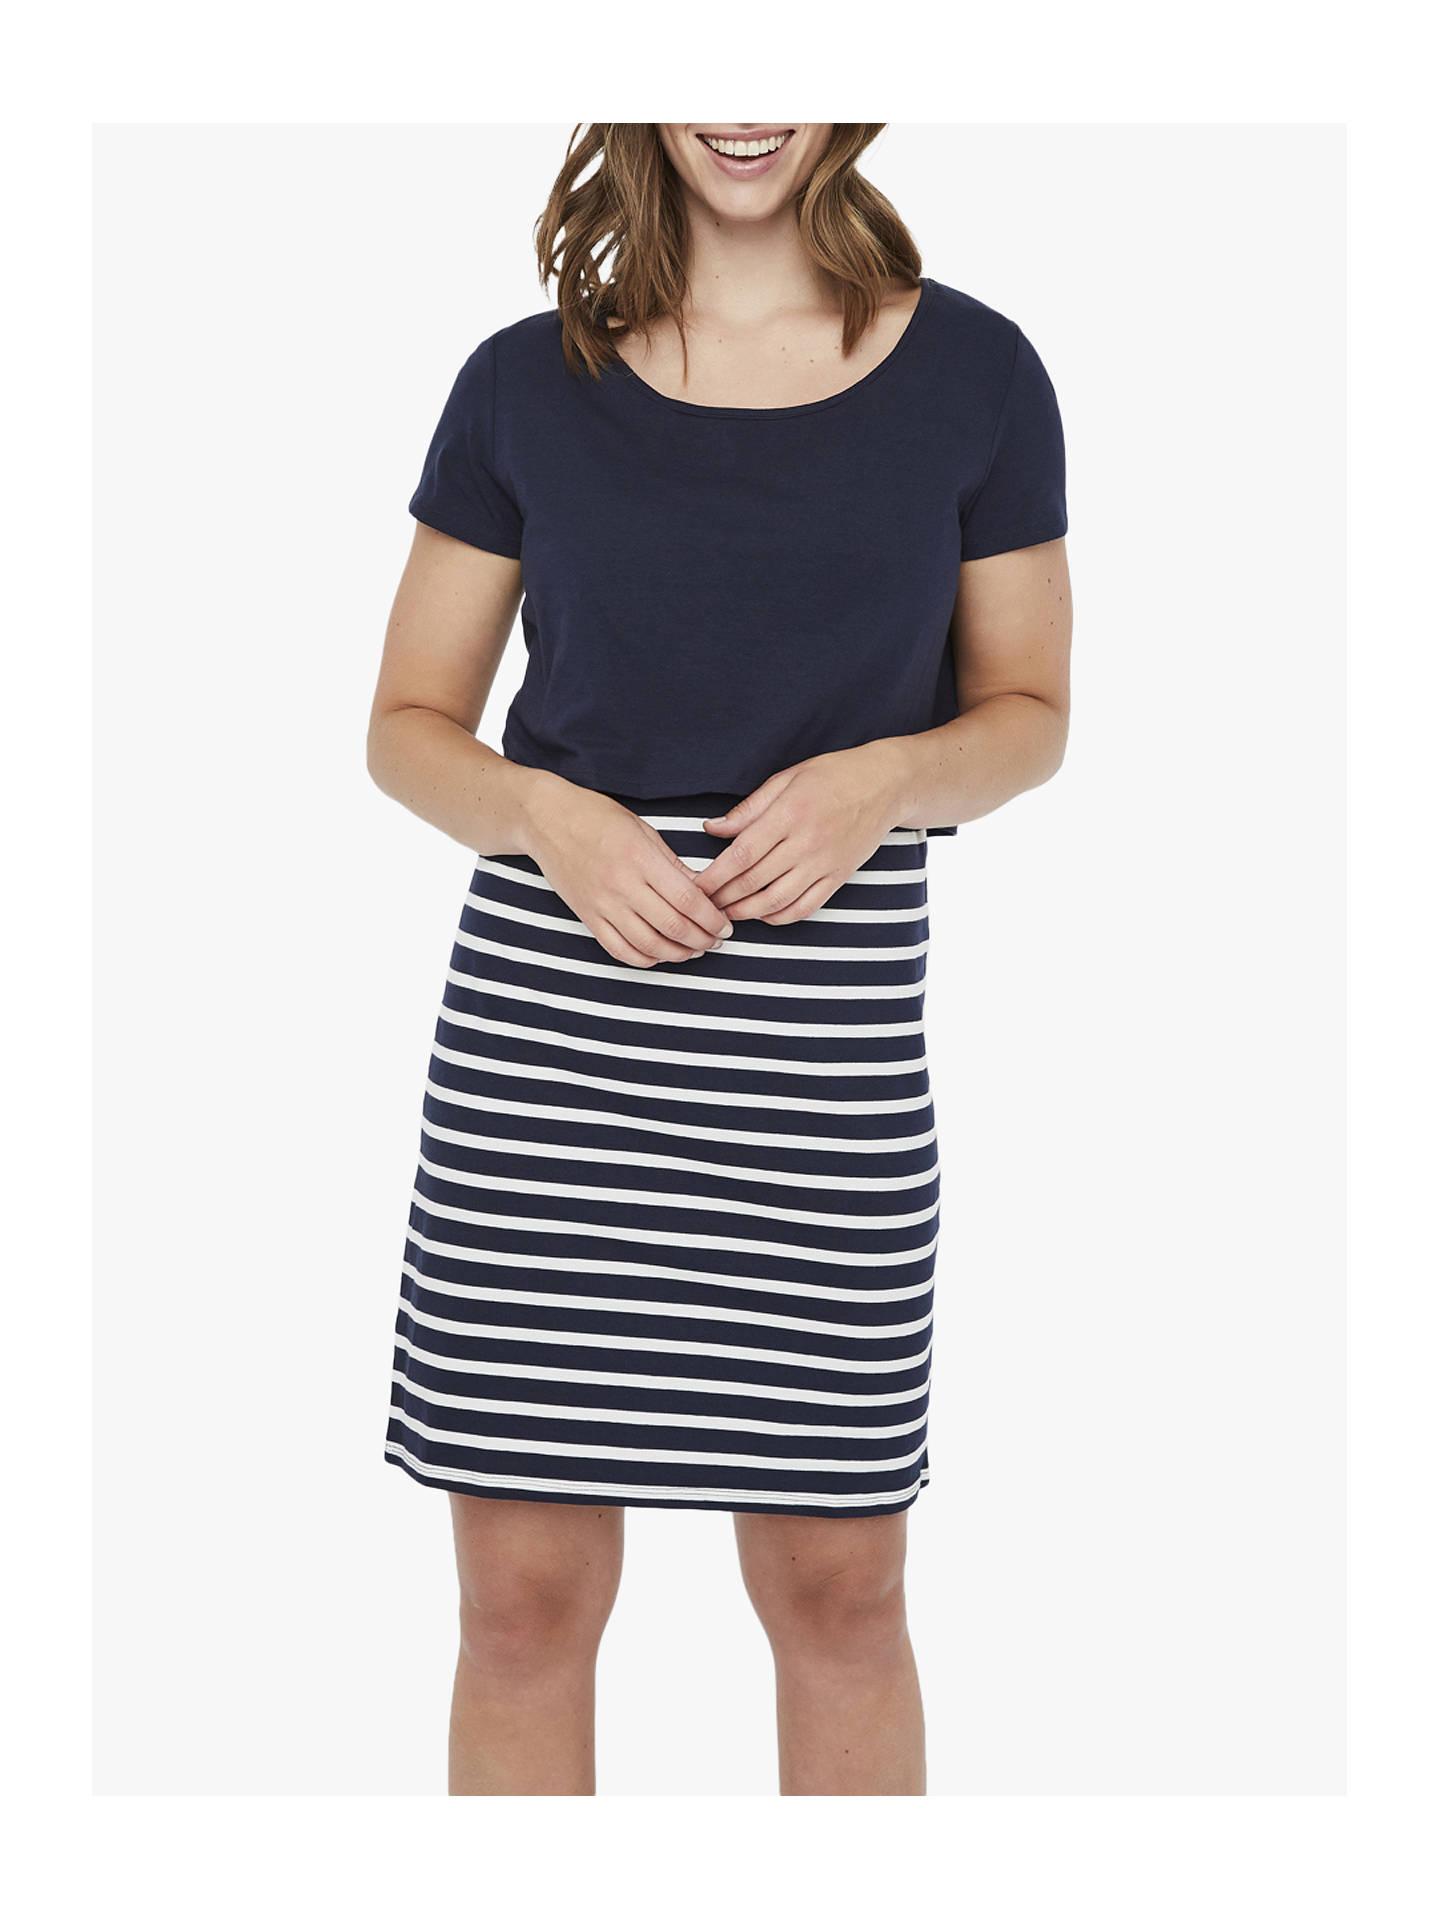 3c700ee30e Buy Mamalicious Lea June Maternity Nursing Dress